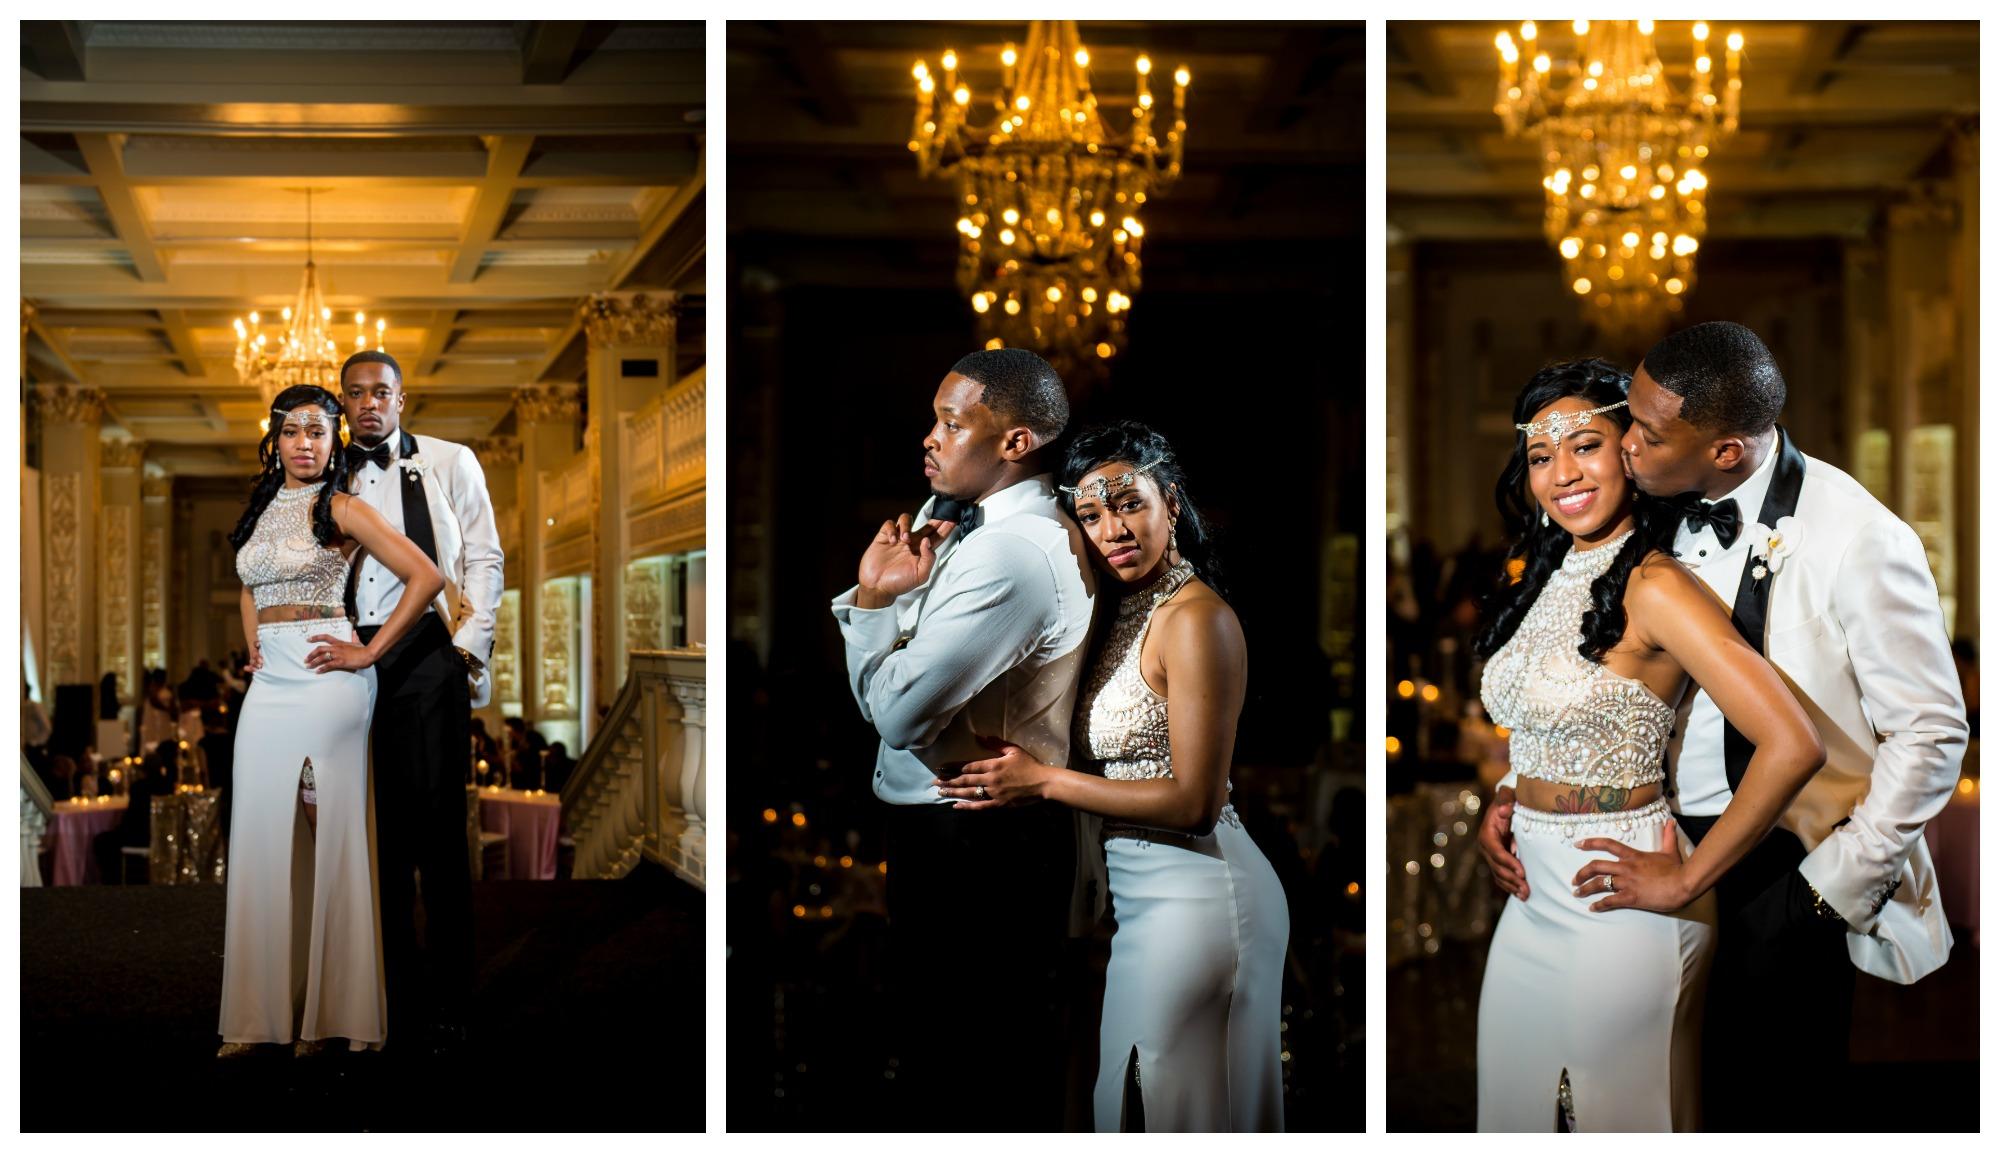 Memphis Wedding, Bride and Groom